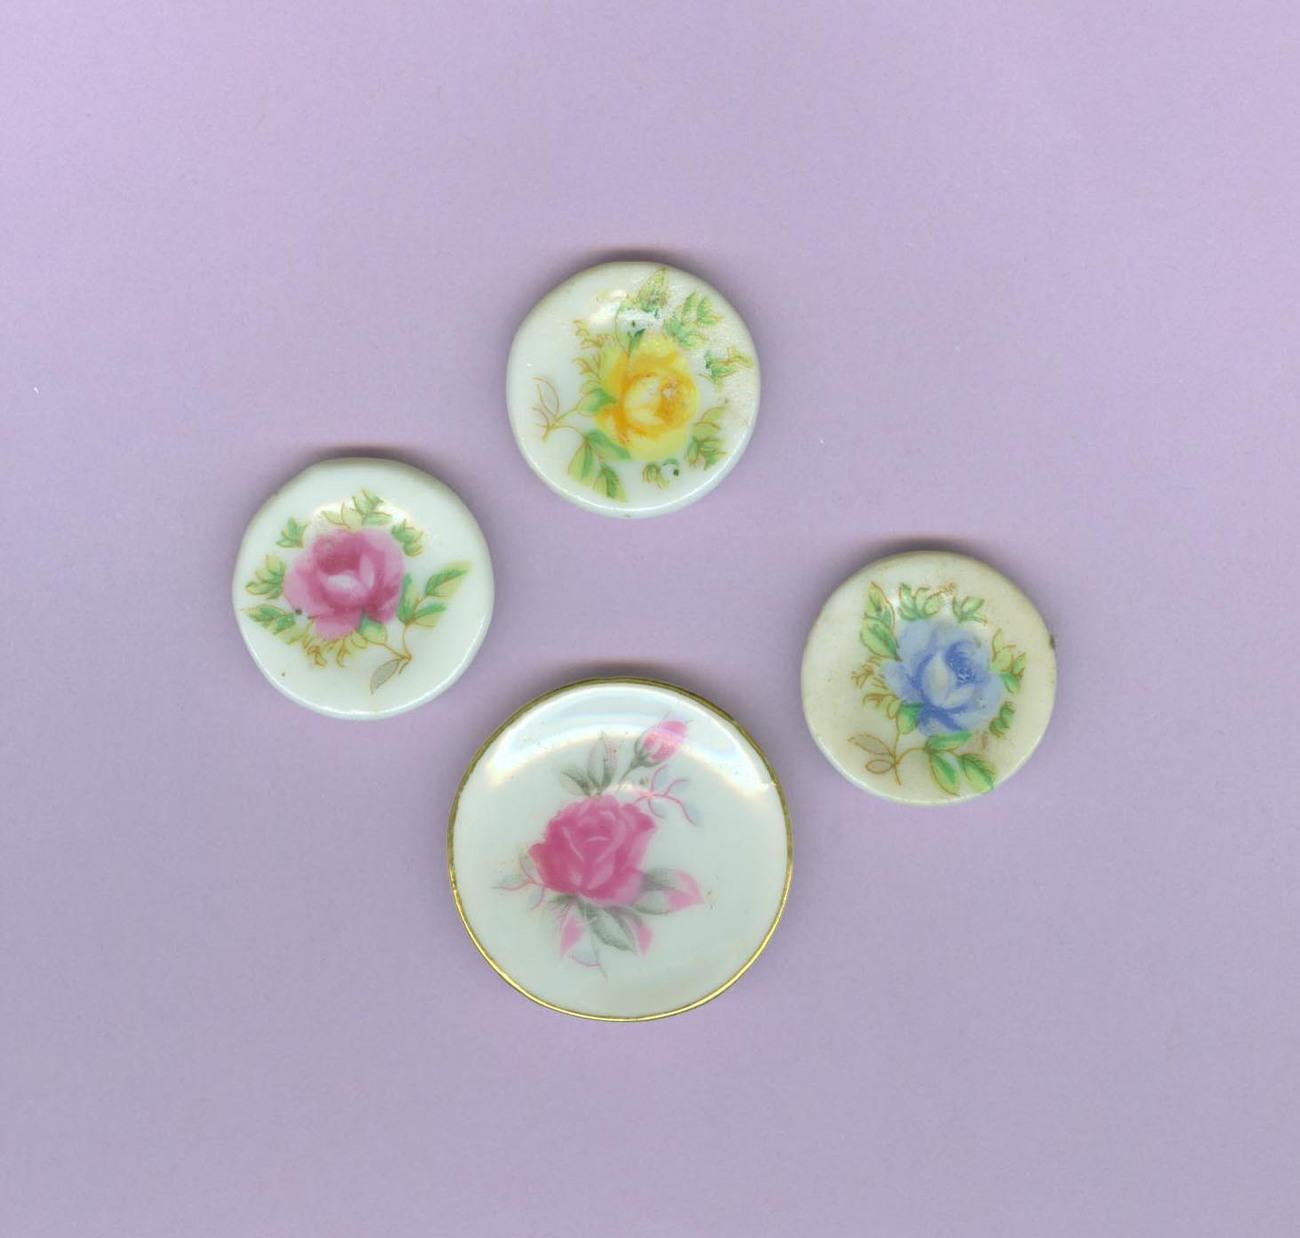 Decorative Wall Plates Nz : Doll house mini decorative china plates wall display